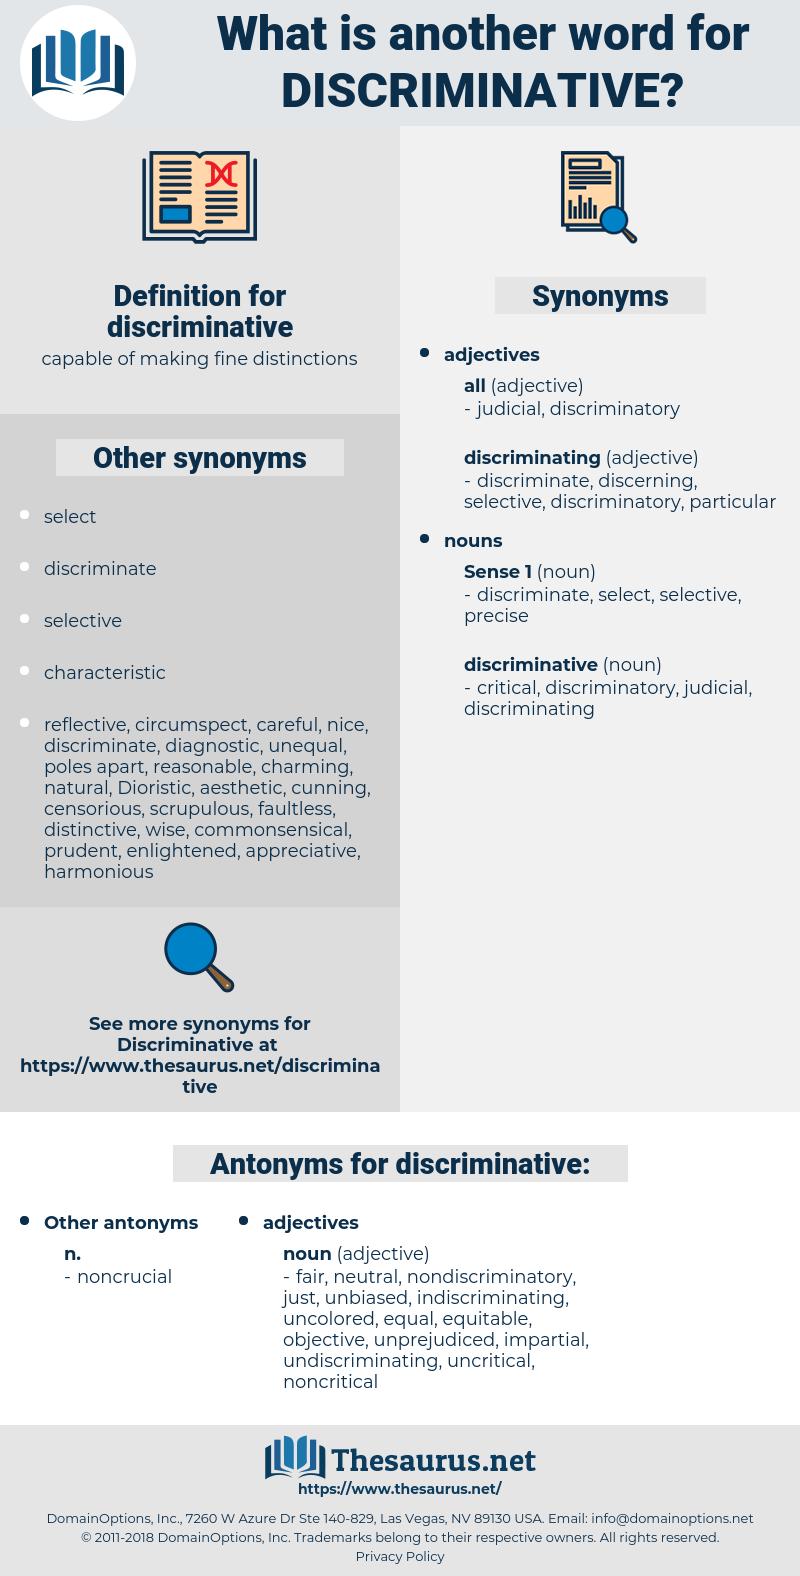 discriminative, synonym discriminative, another word for discriminative, words like discriminative, thesaurus discriminative